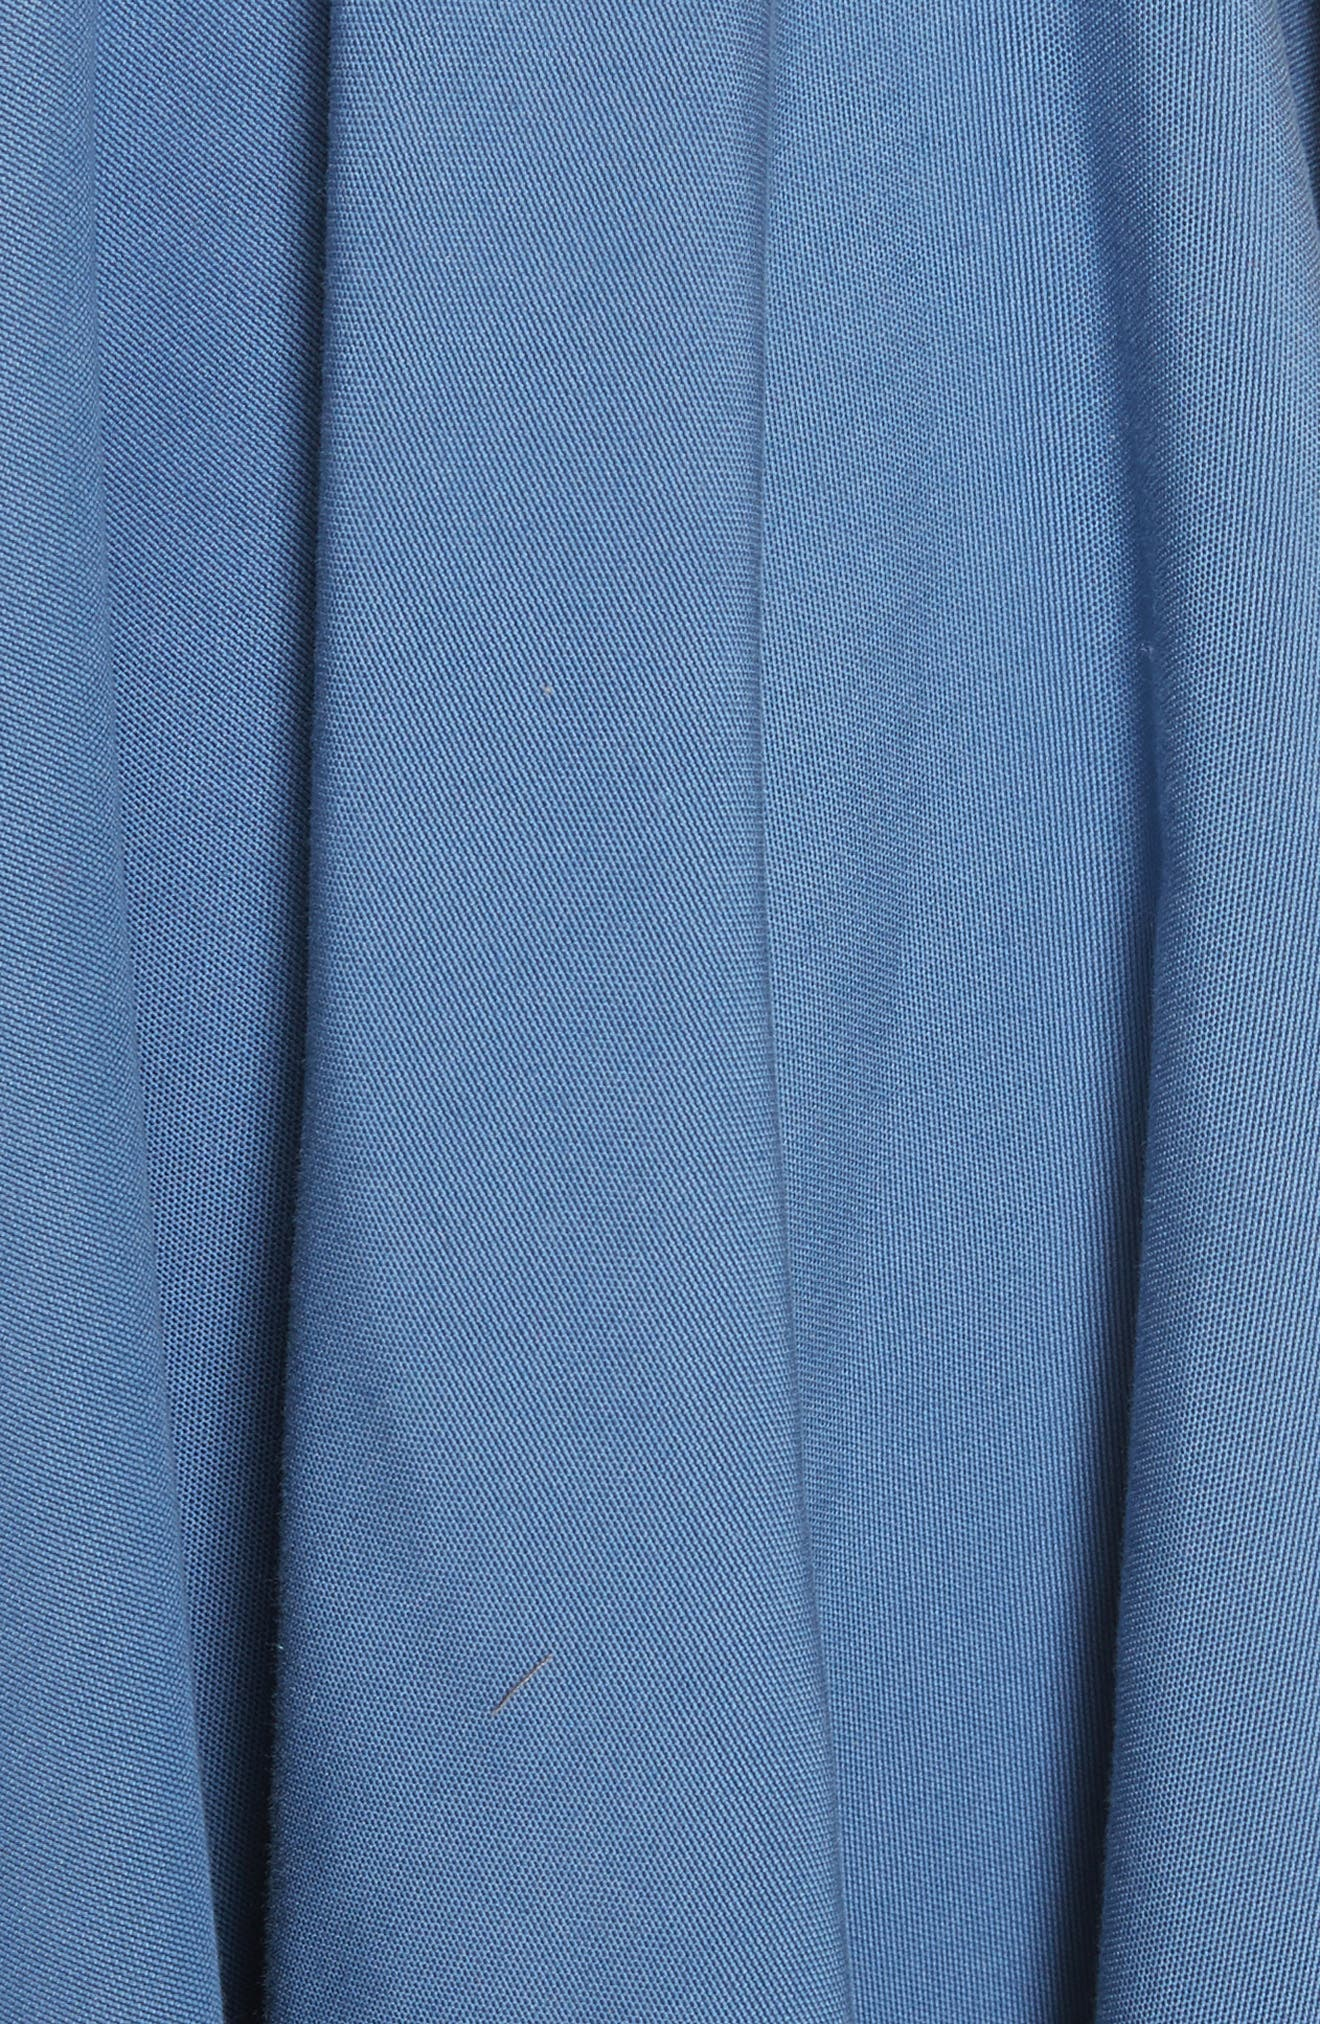 Zip Detail Circle Skirt,                             Alternate thumbnail 5, color,                             422